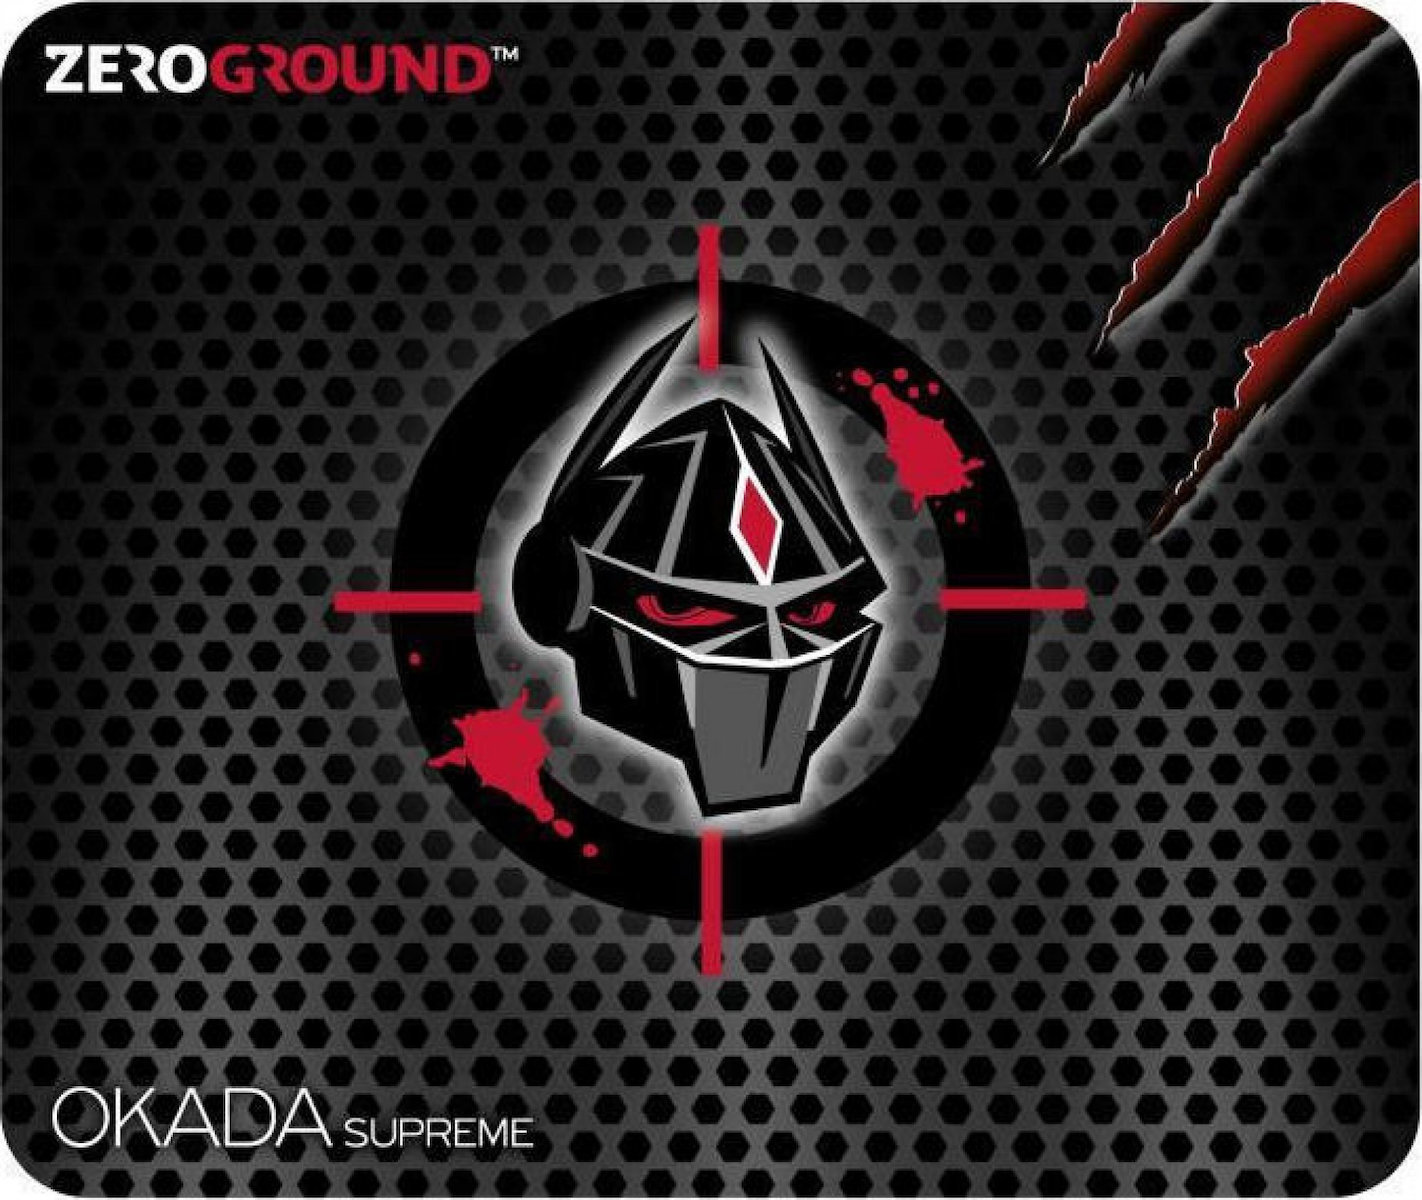 Zeroground MP-1600G Okada Supreme v2.0 Gaming Mousepad